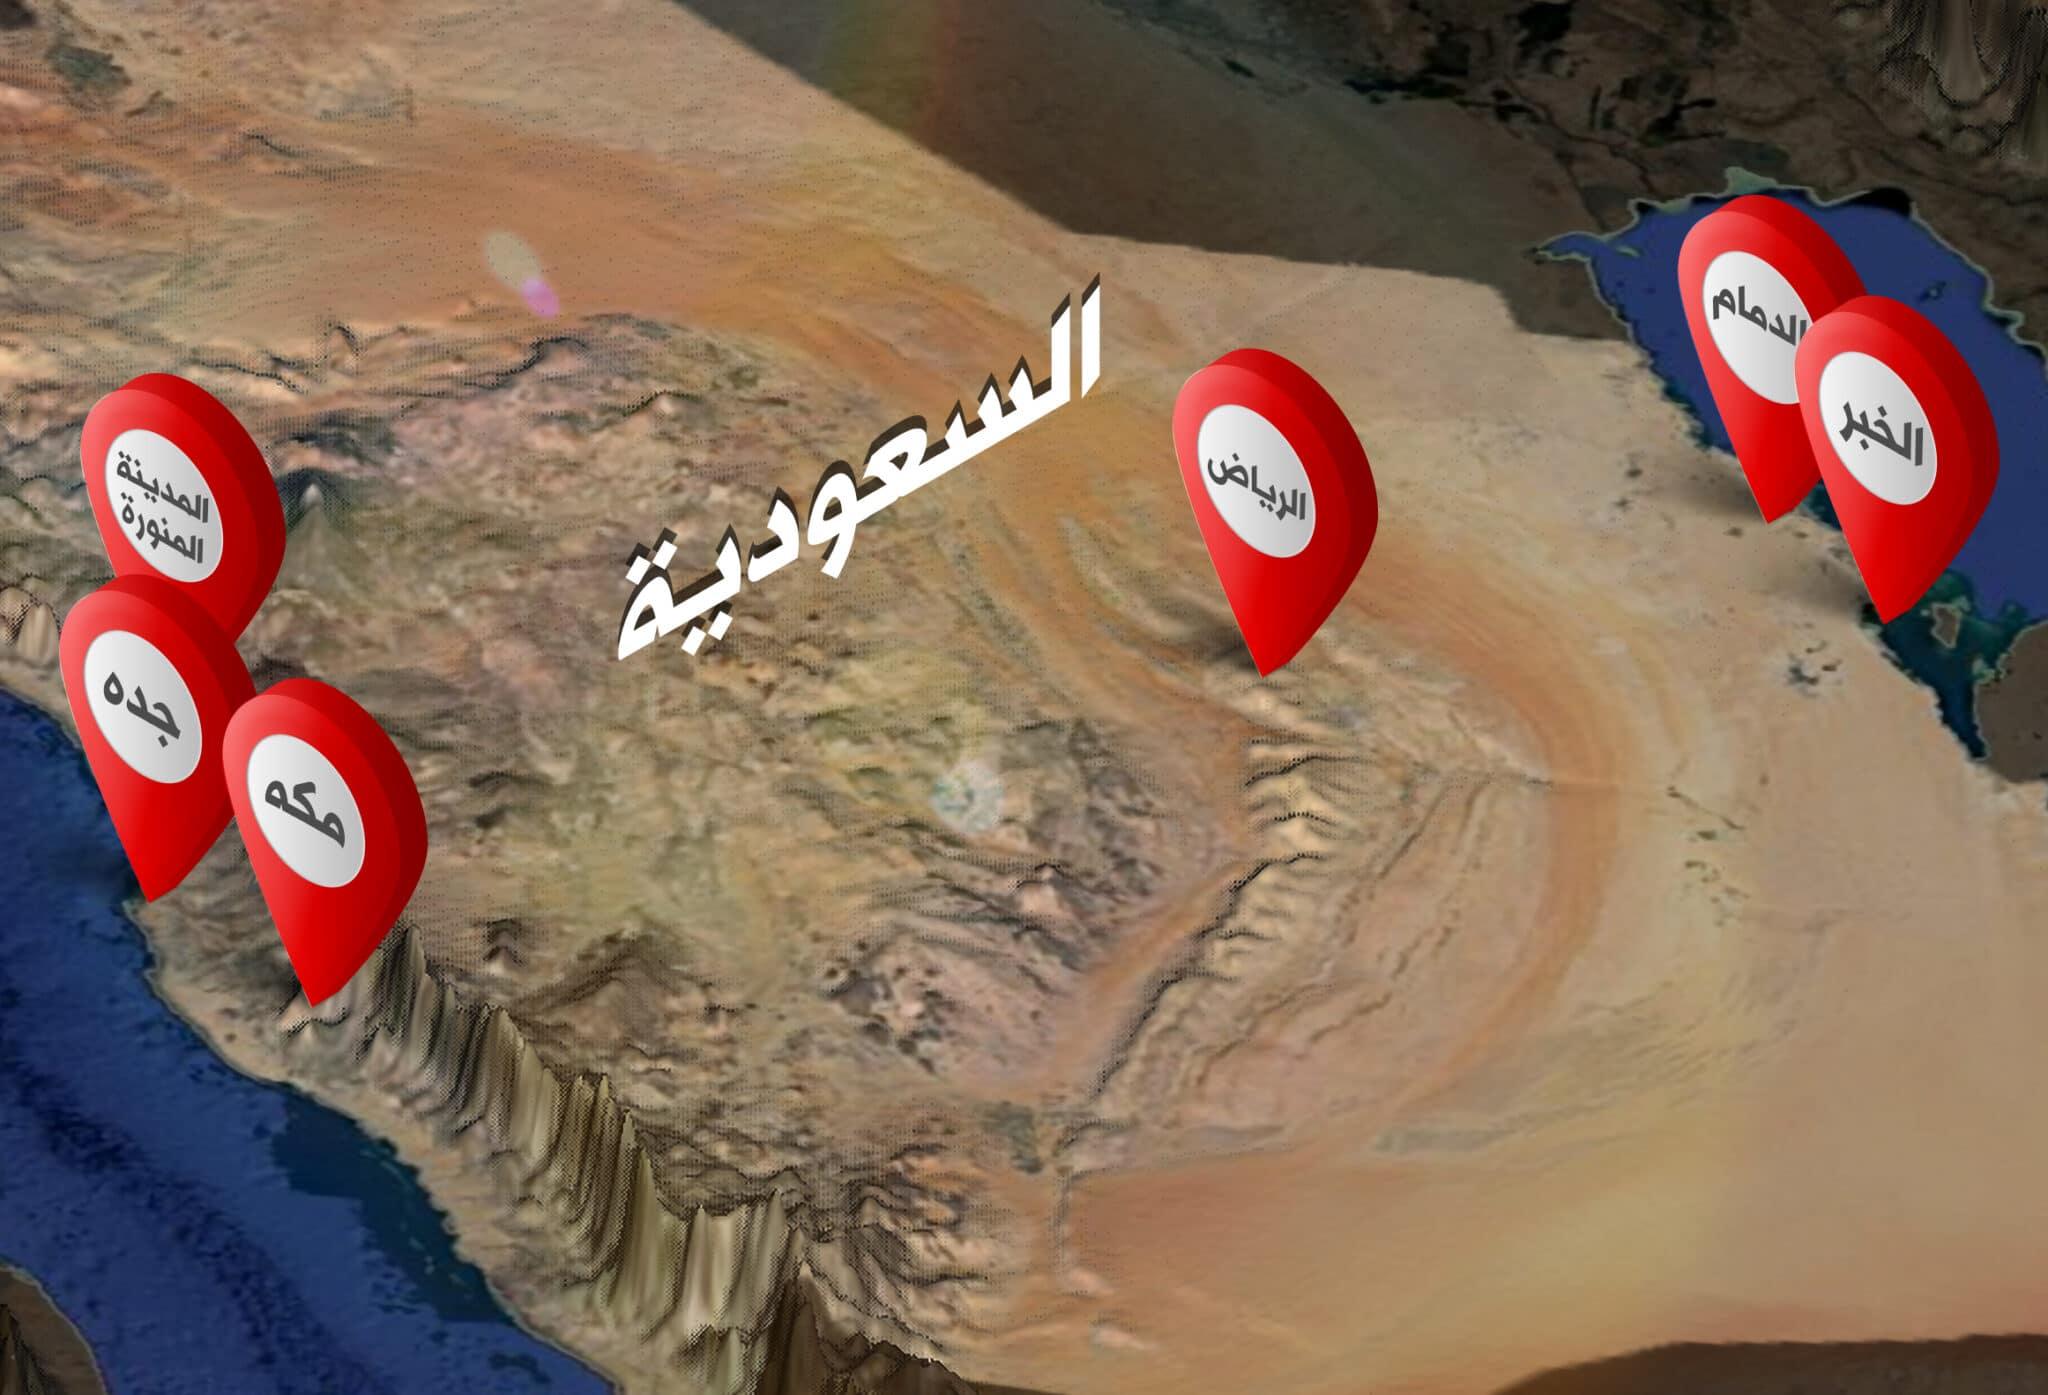 Saudi Outdoor OOH